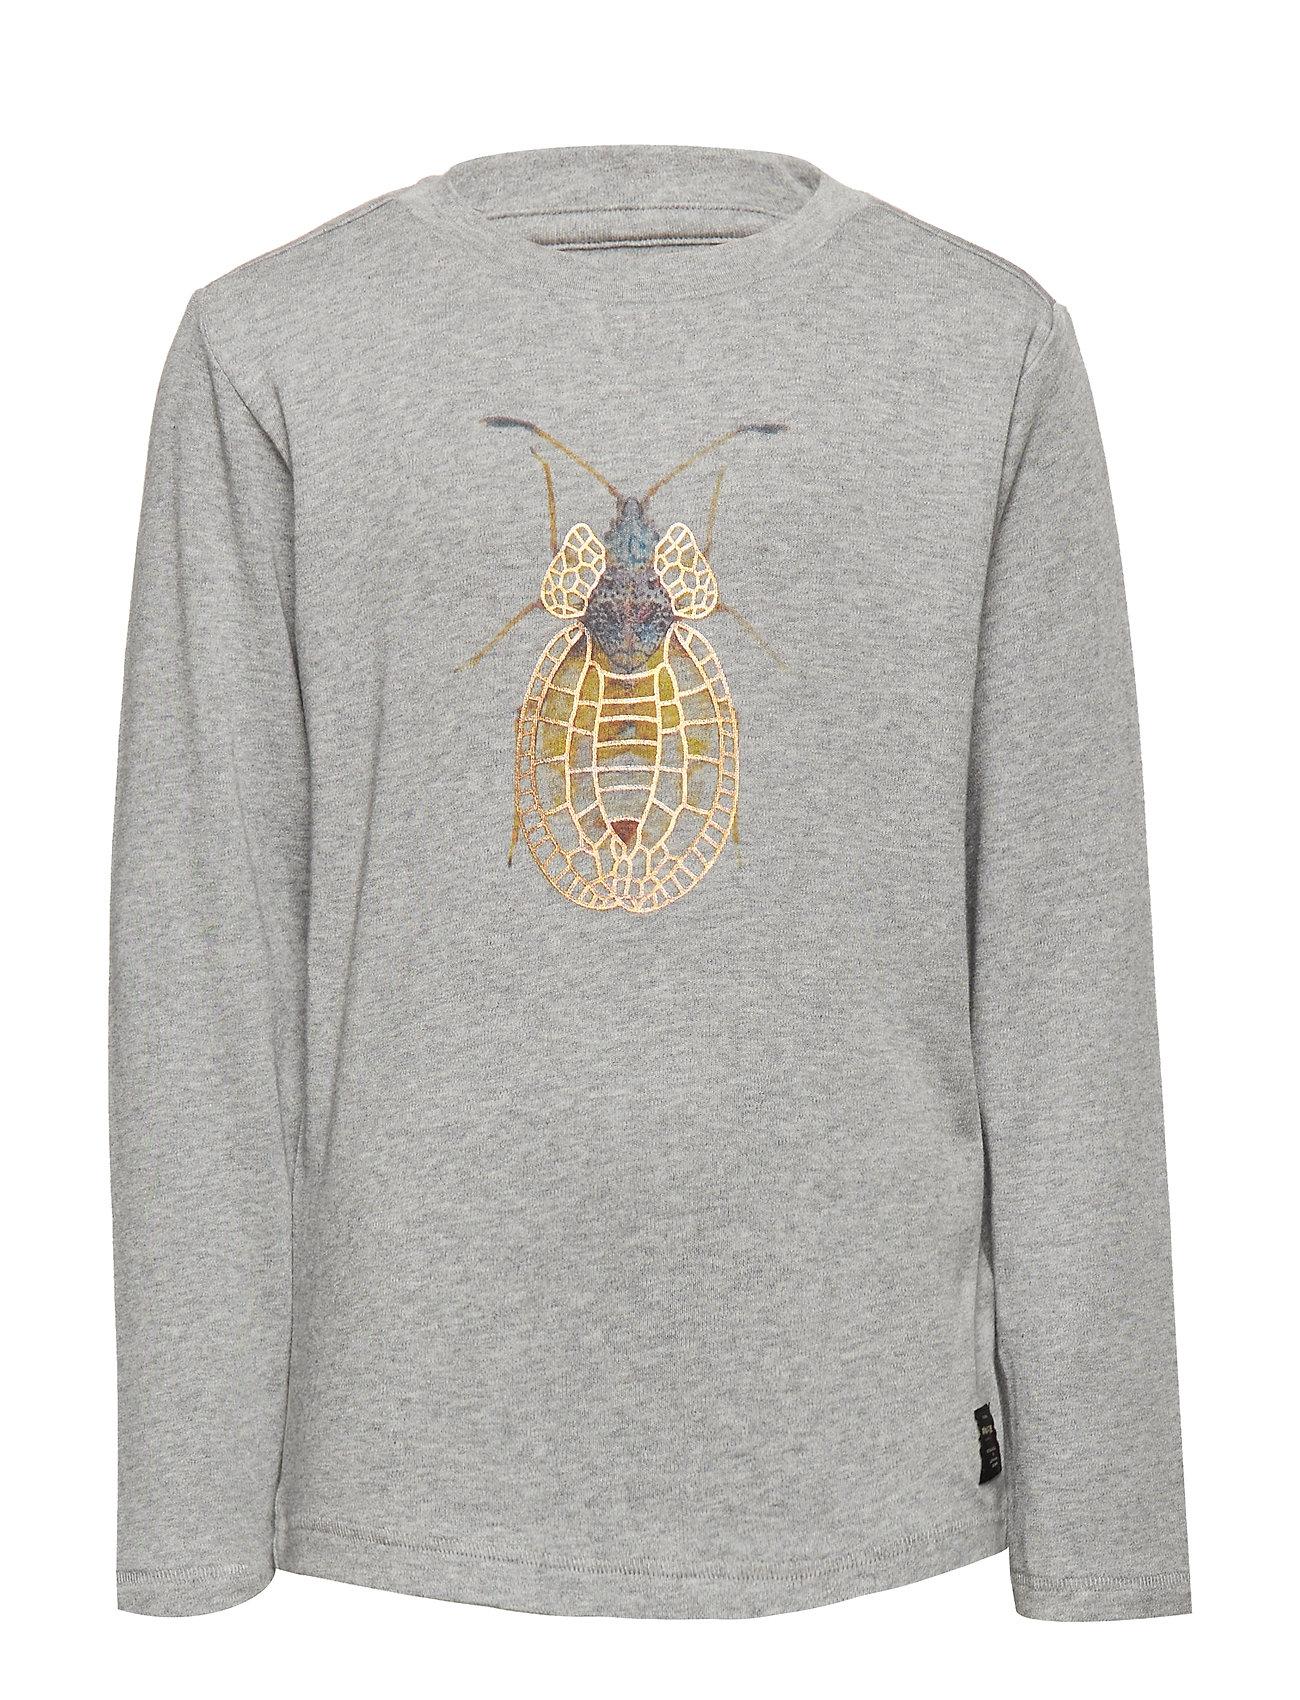 Mini A Ture Agner T-shirt, K - GREY MELANGE